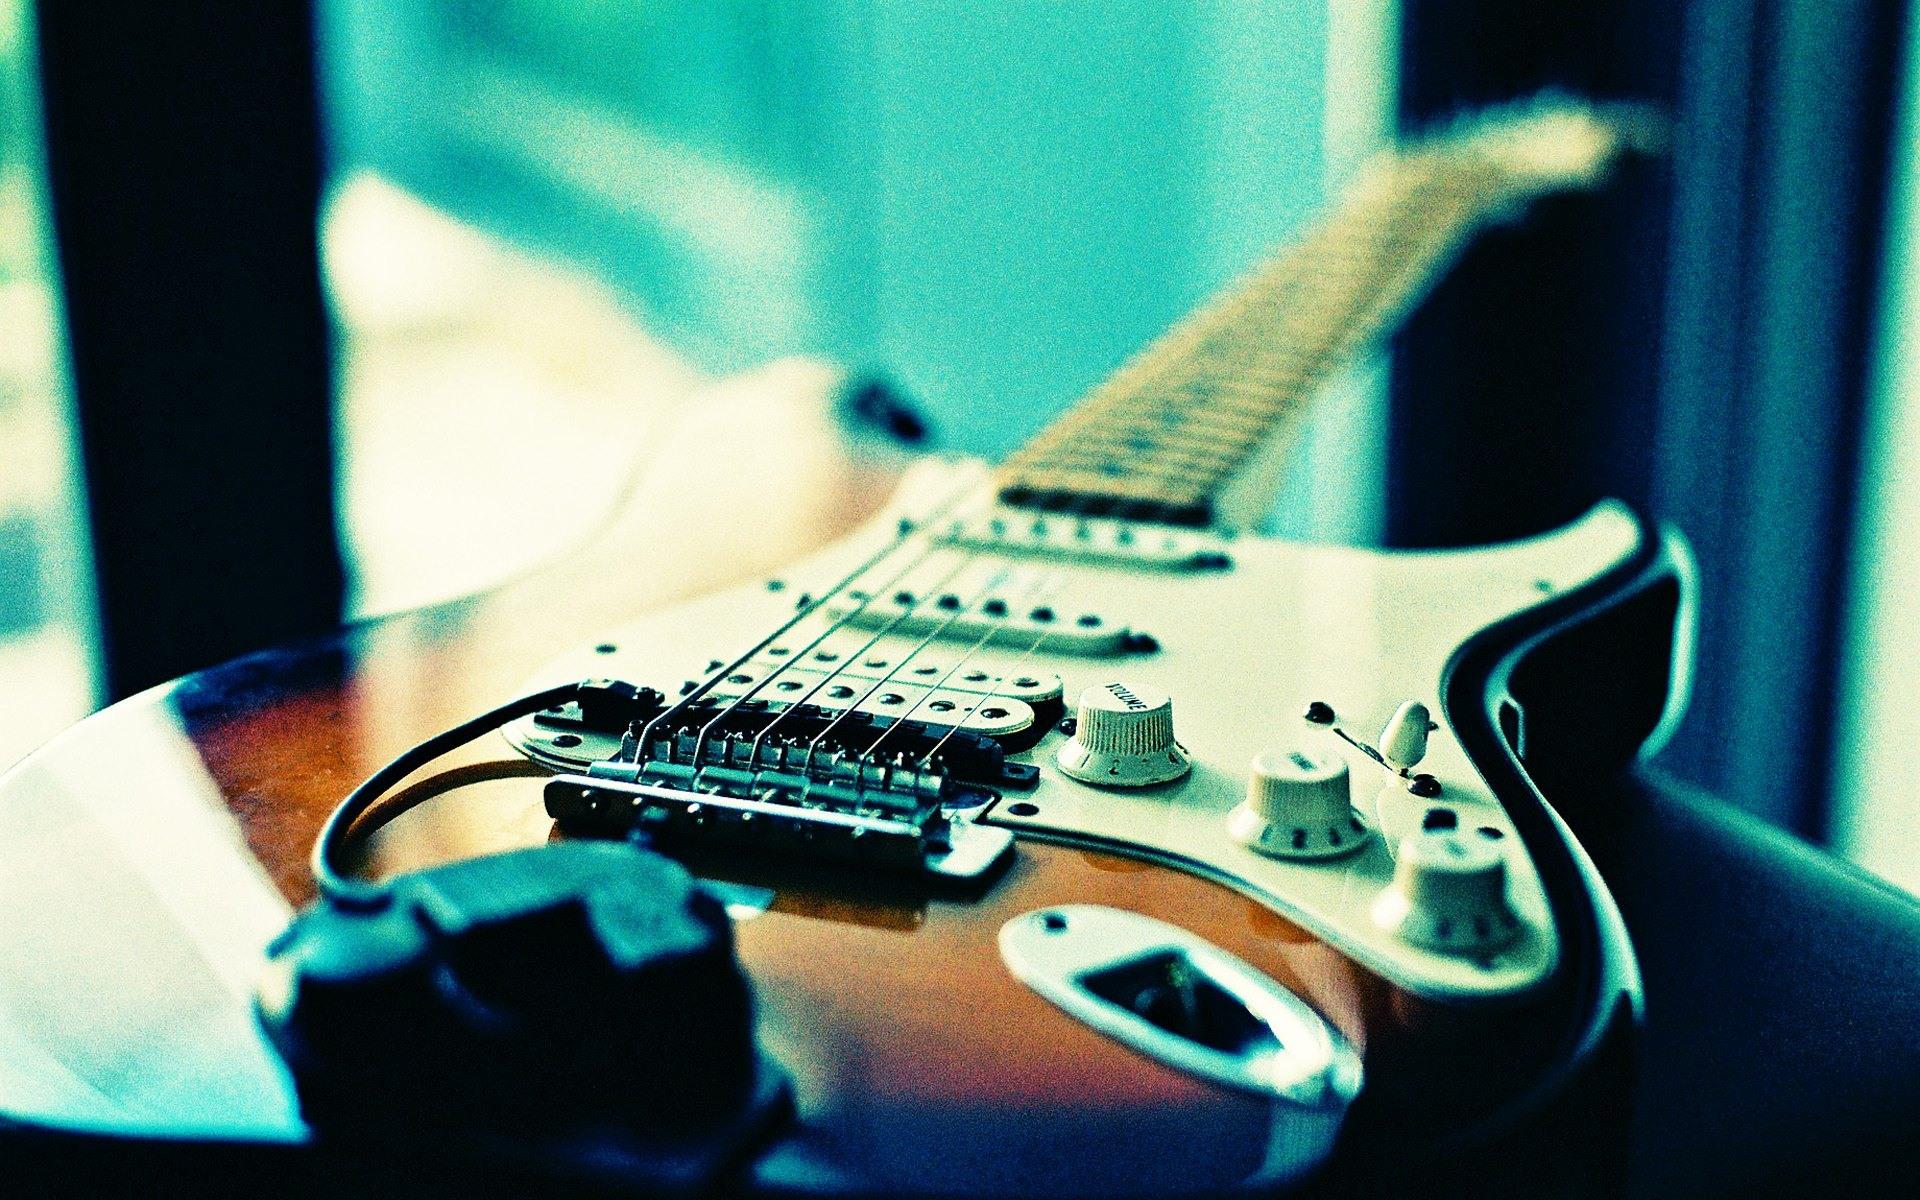 Fender Wallpaper High Resolution Wallpapersafari